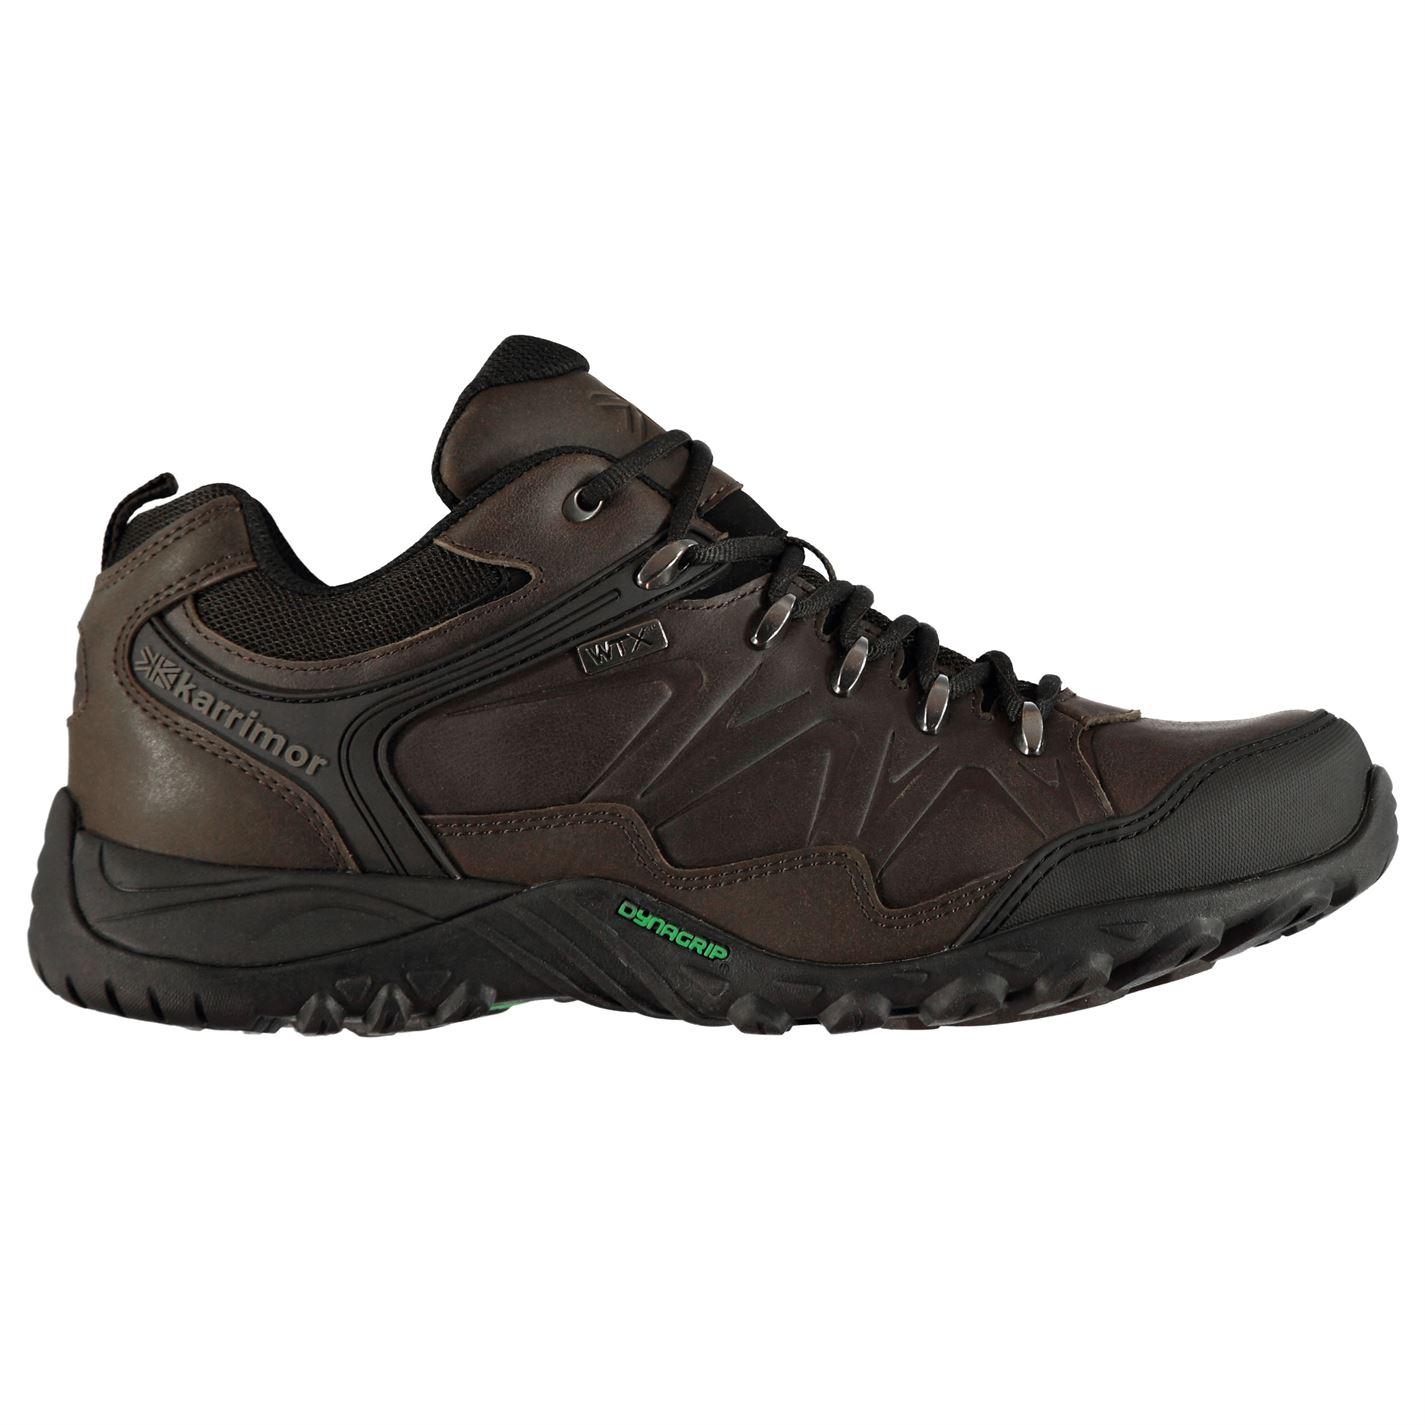 a4a9d3bd2480 boty Karrimor Ridge Leather Walking Shoes pánské